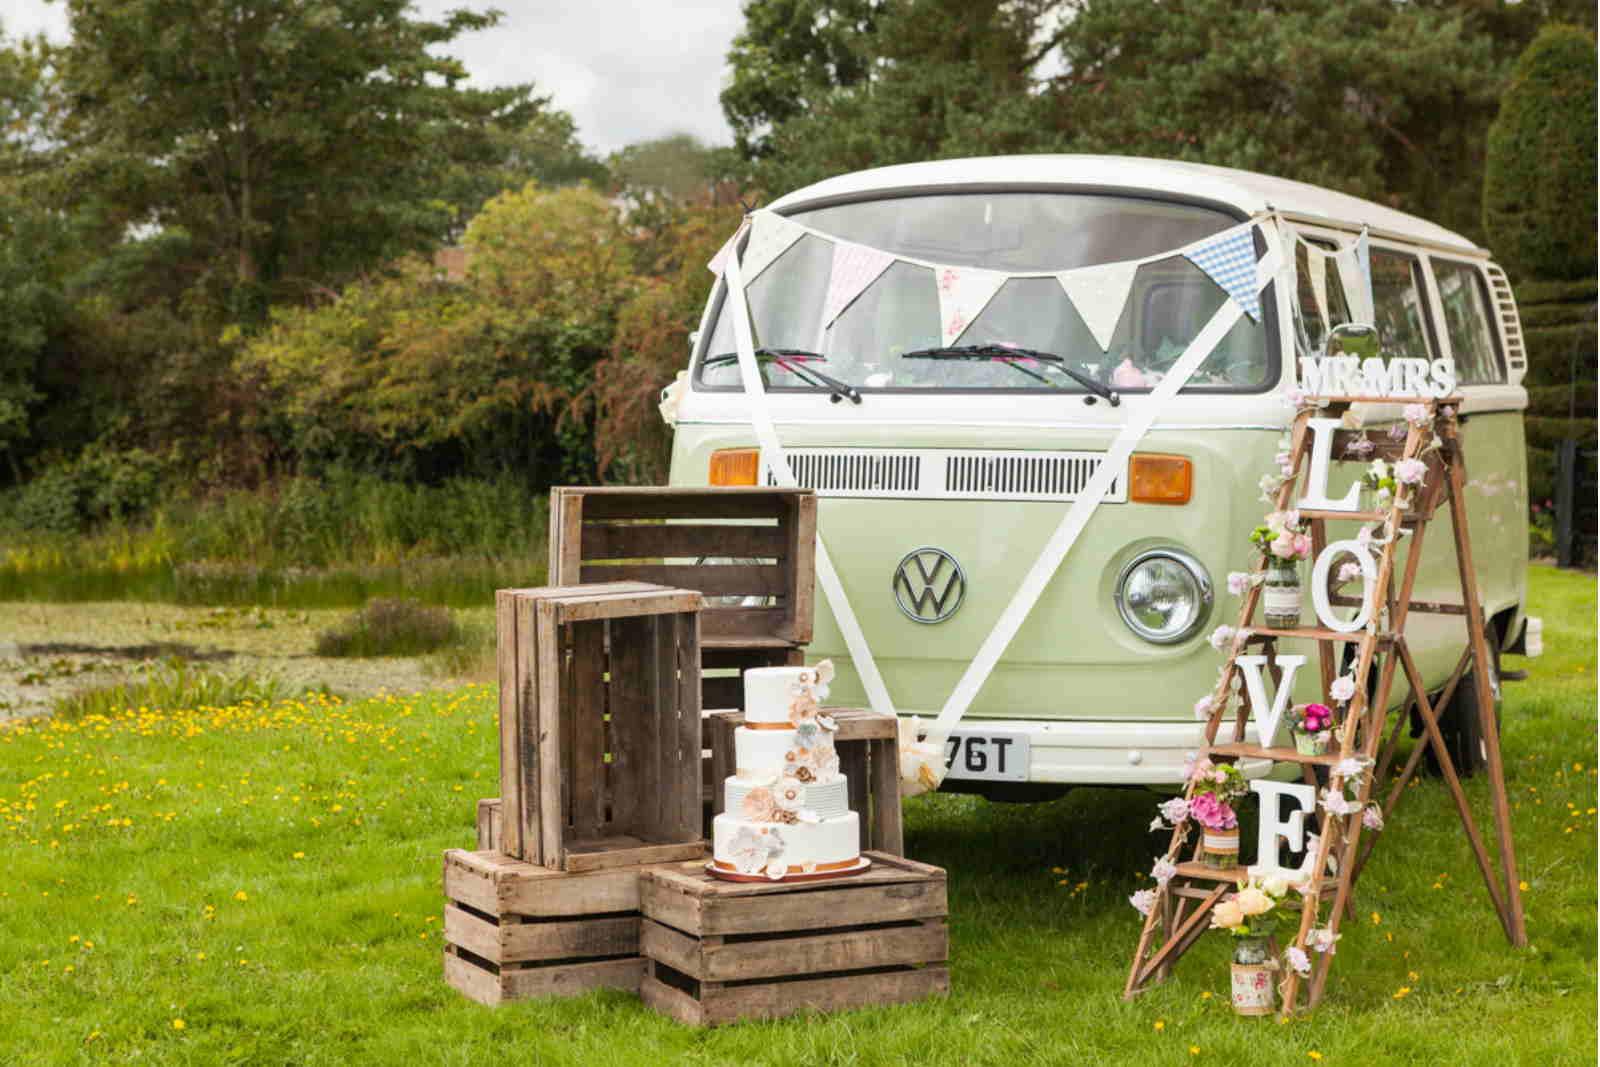 green campervan wedding car hire surrey sussex london kent